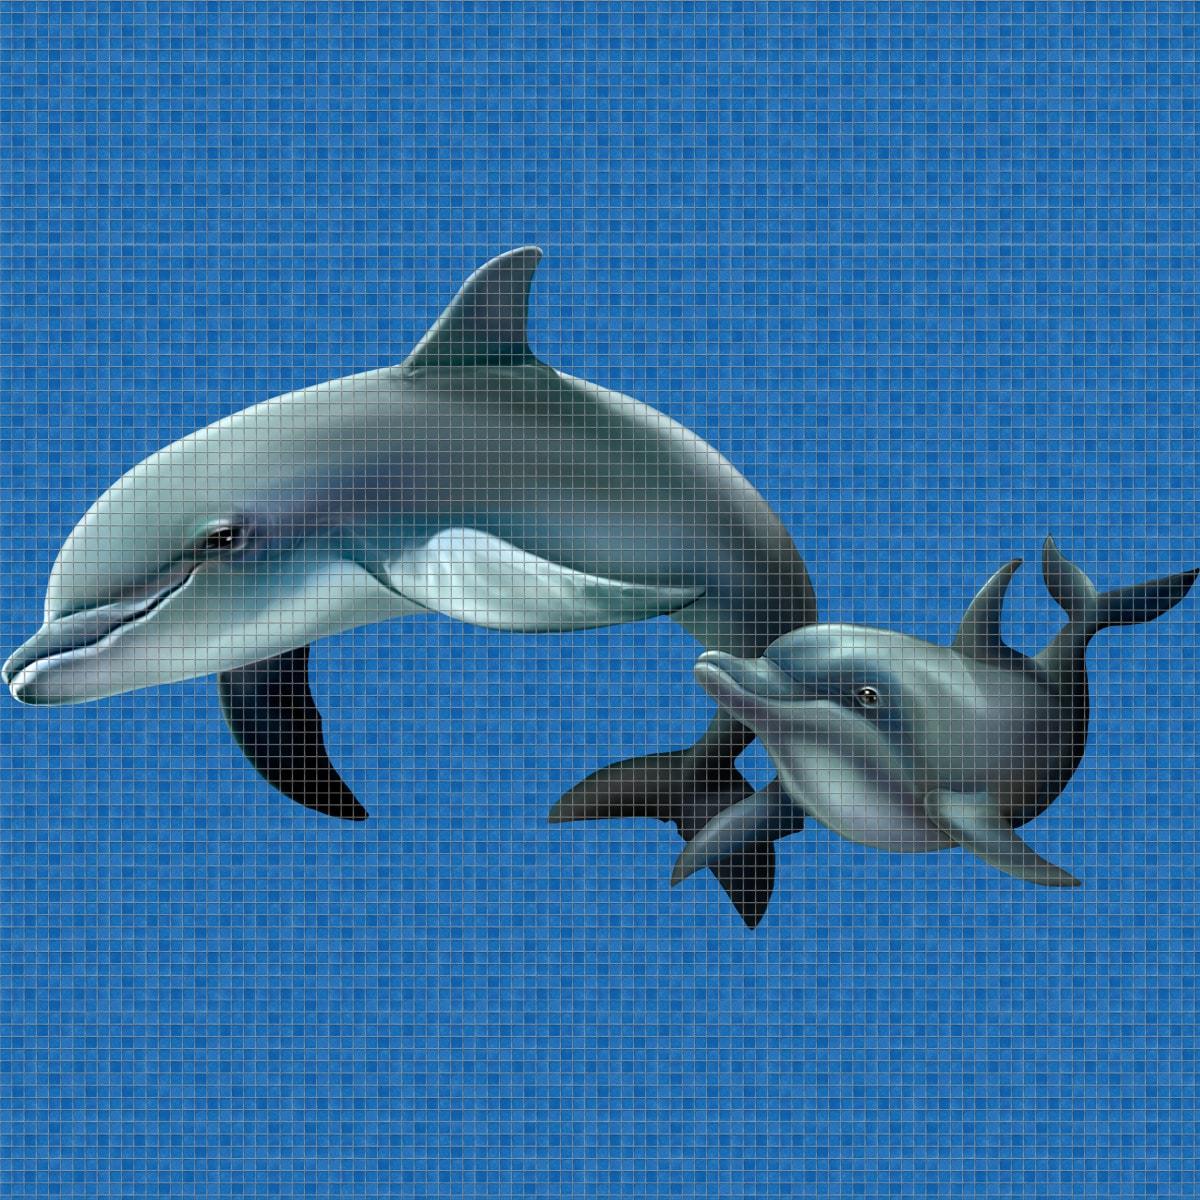 Dolphin-Family-Digital-Print-Mosaic-Ezarri.jpg